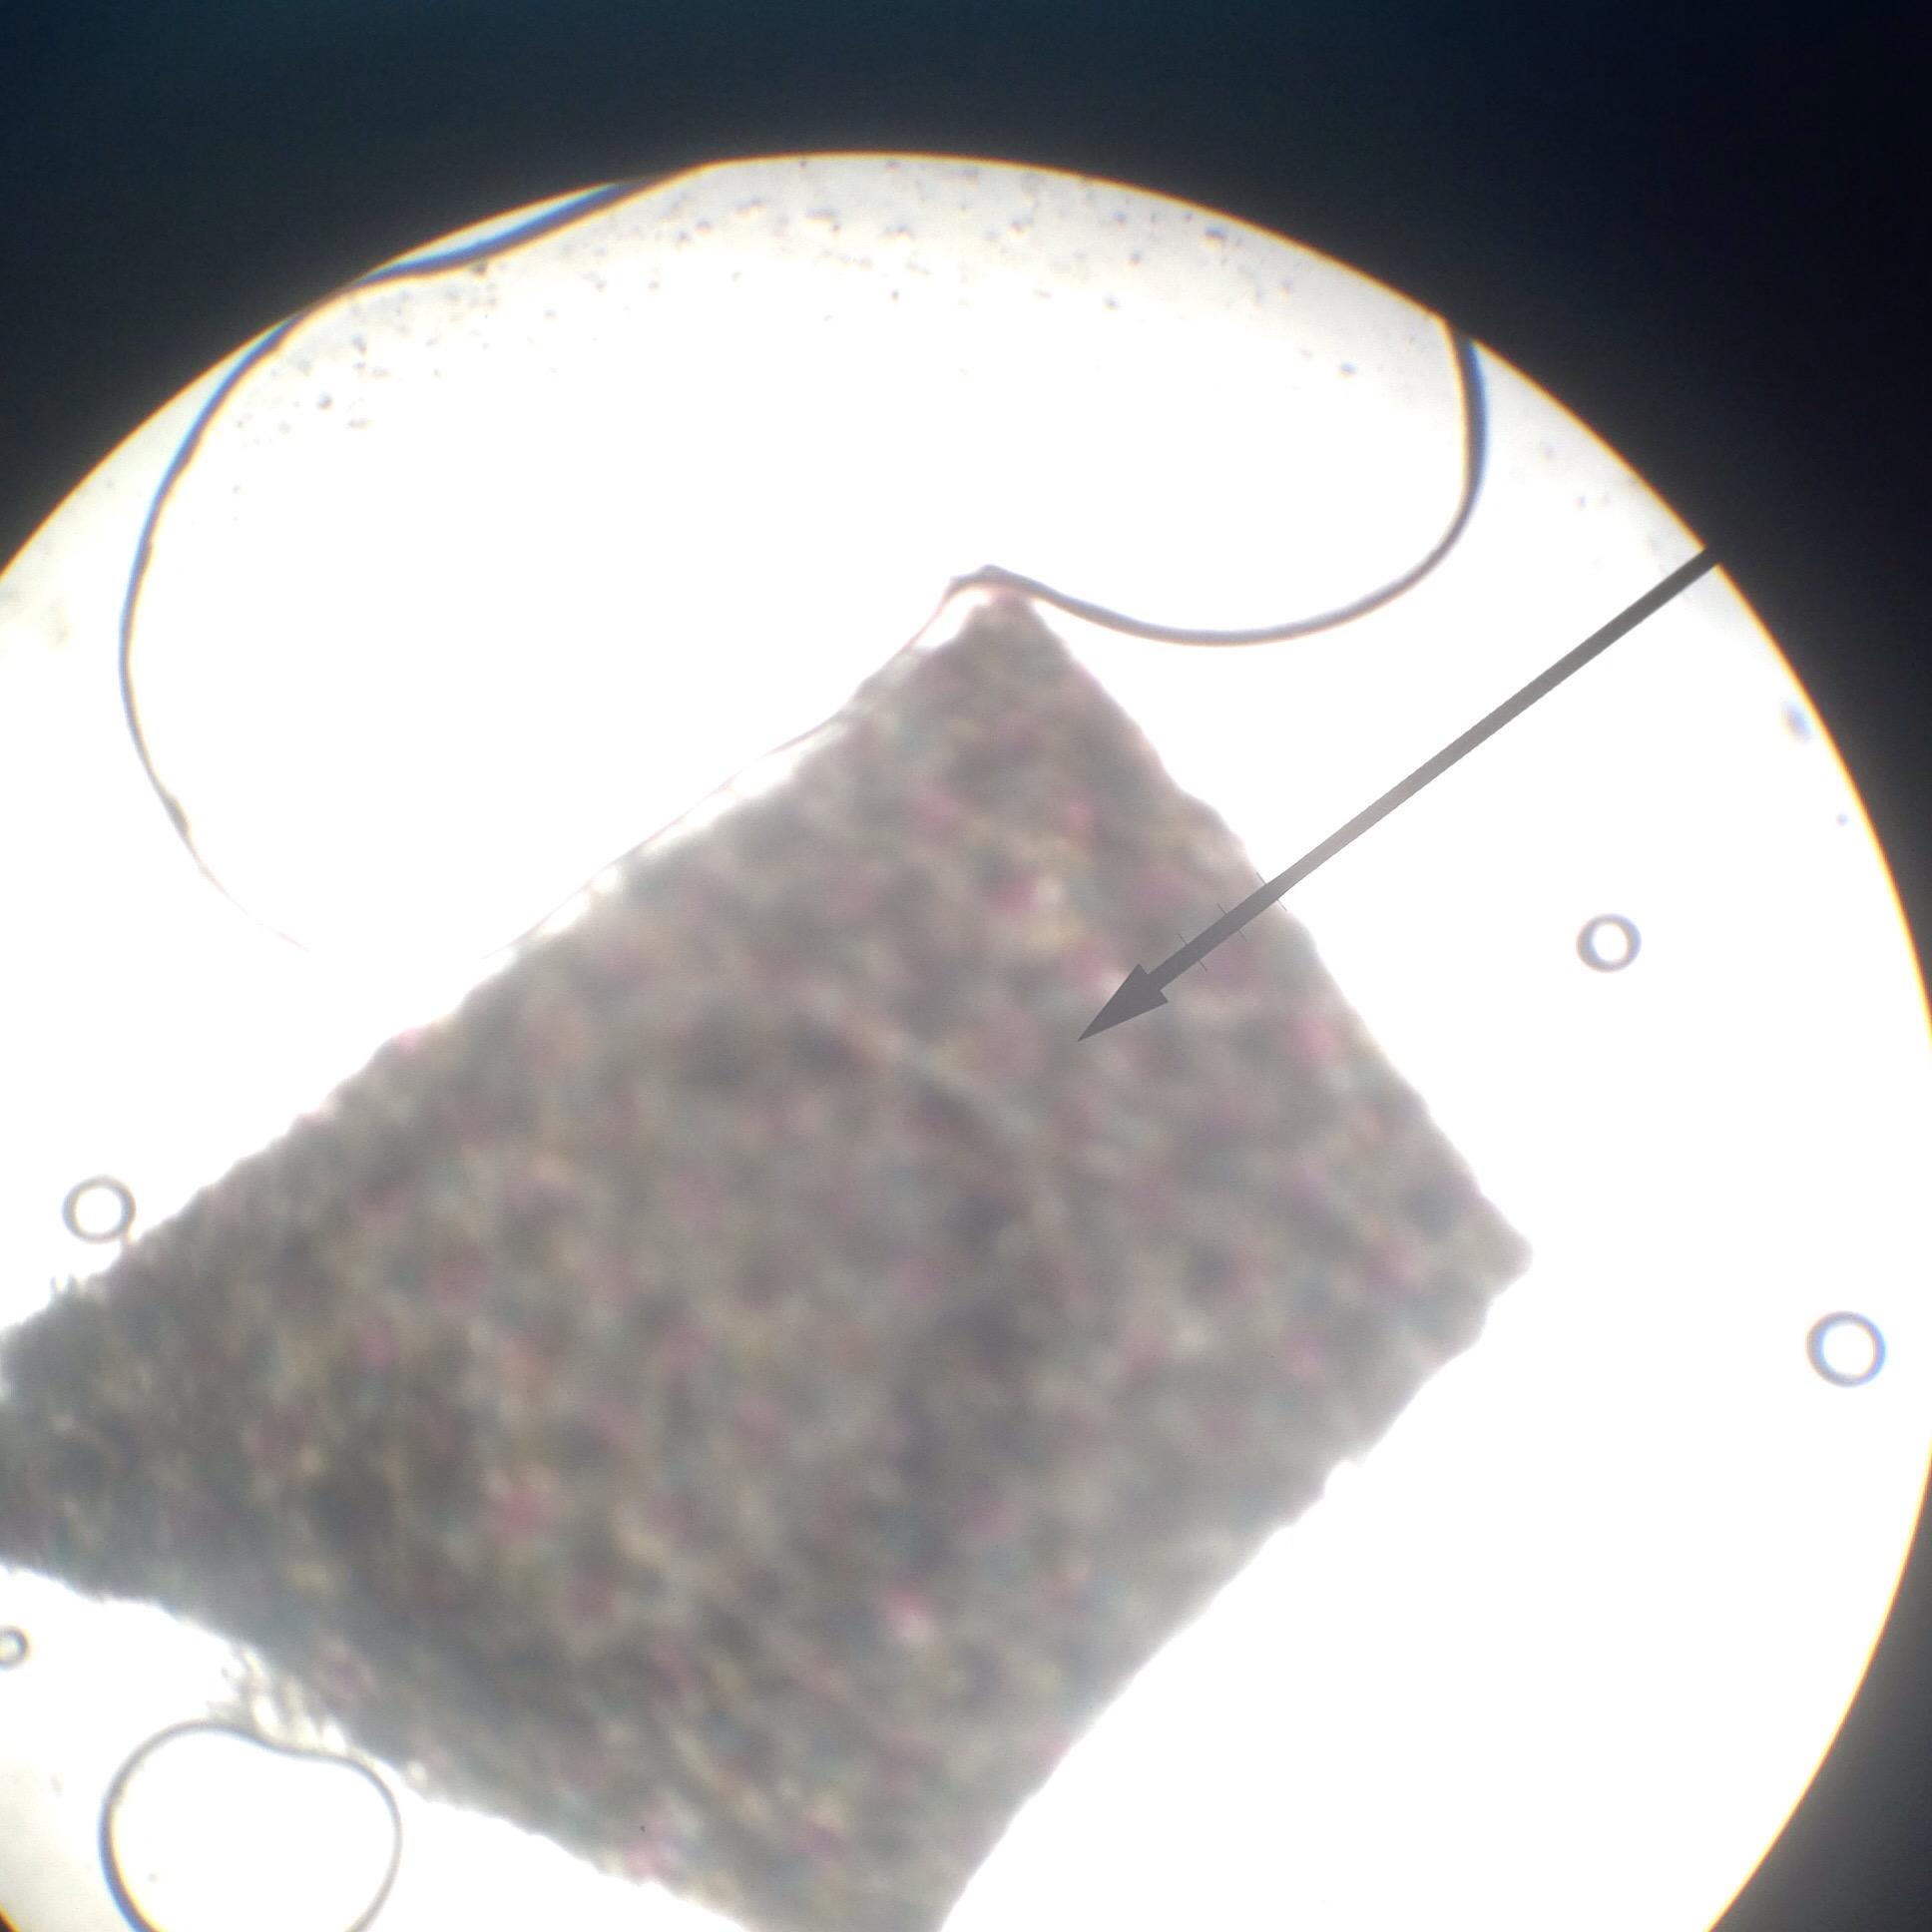 Letter E Microscope Lab Lab Activity The Compound Microscope 02 22